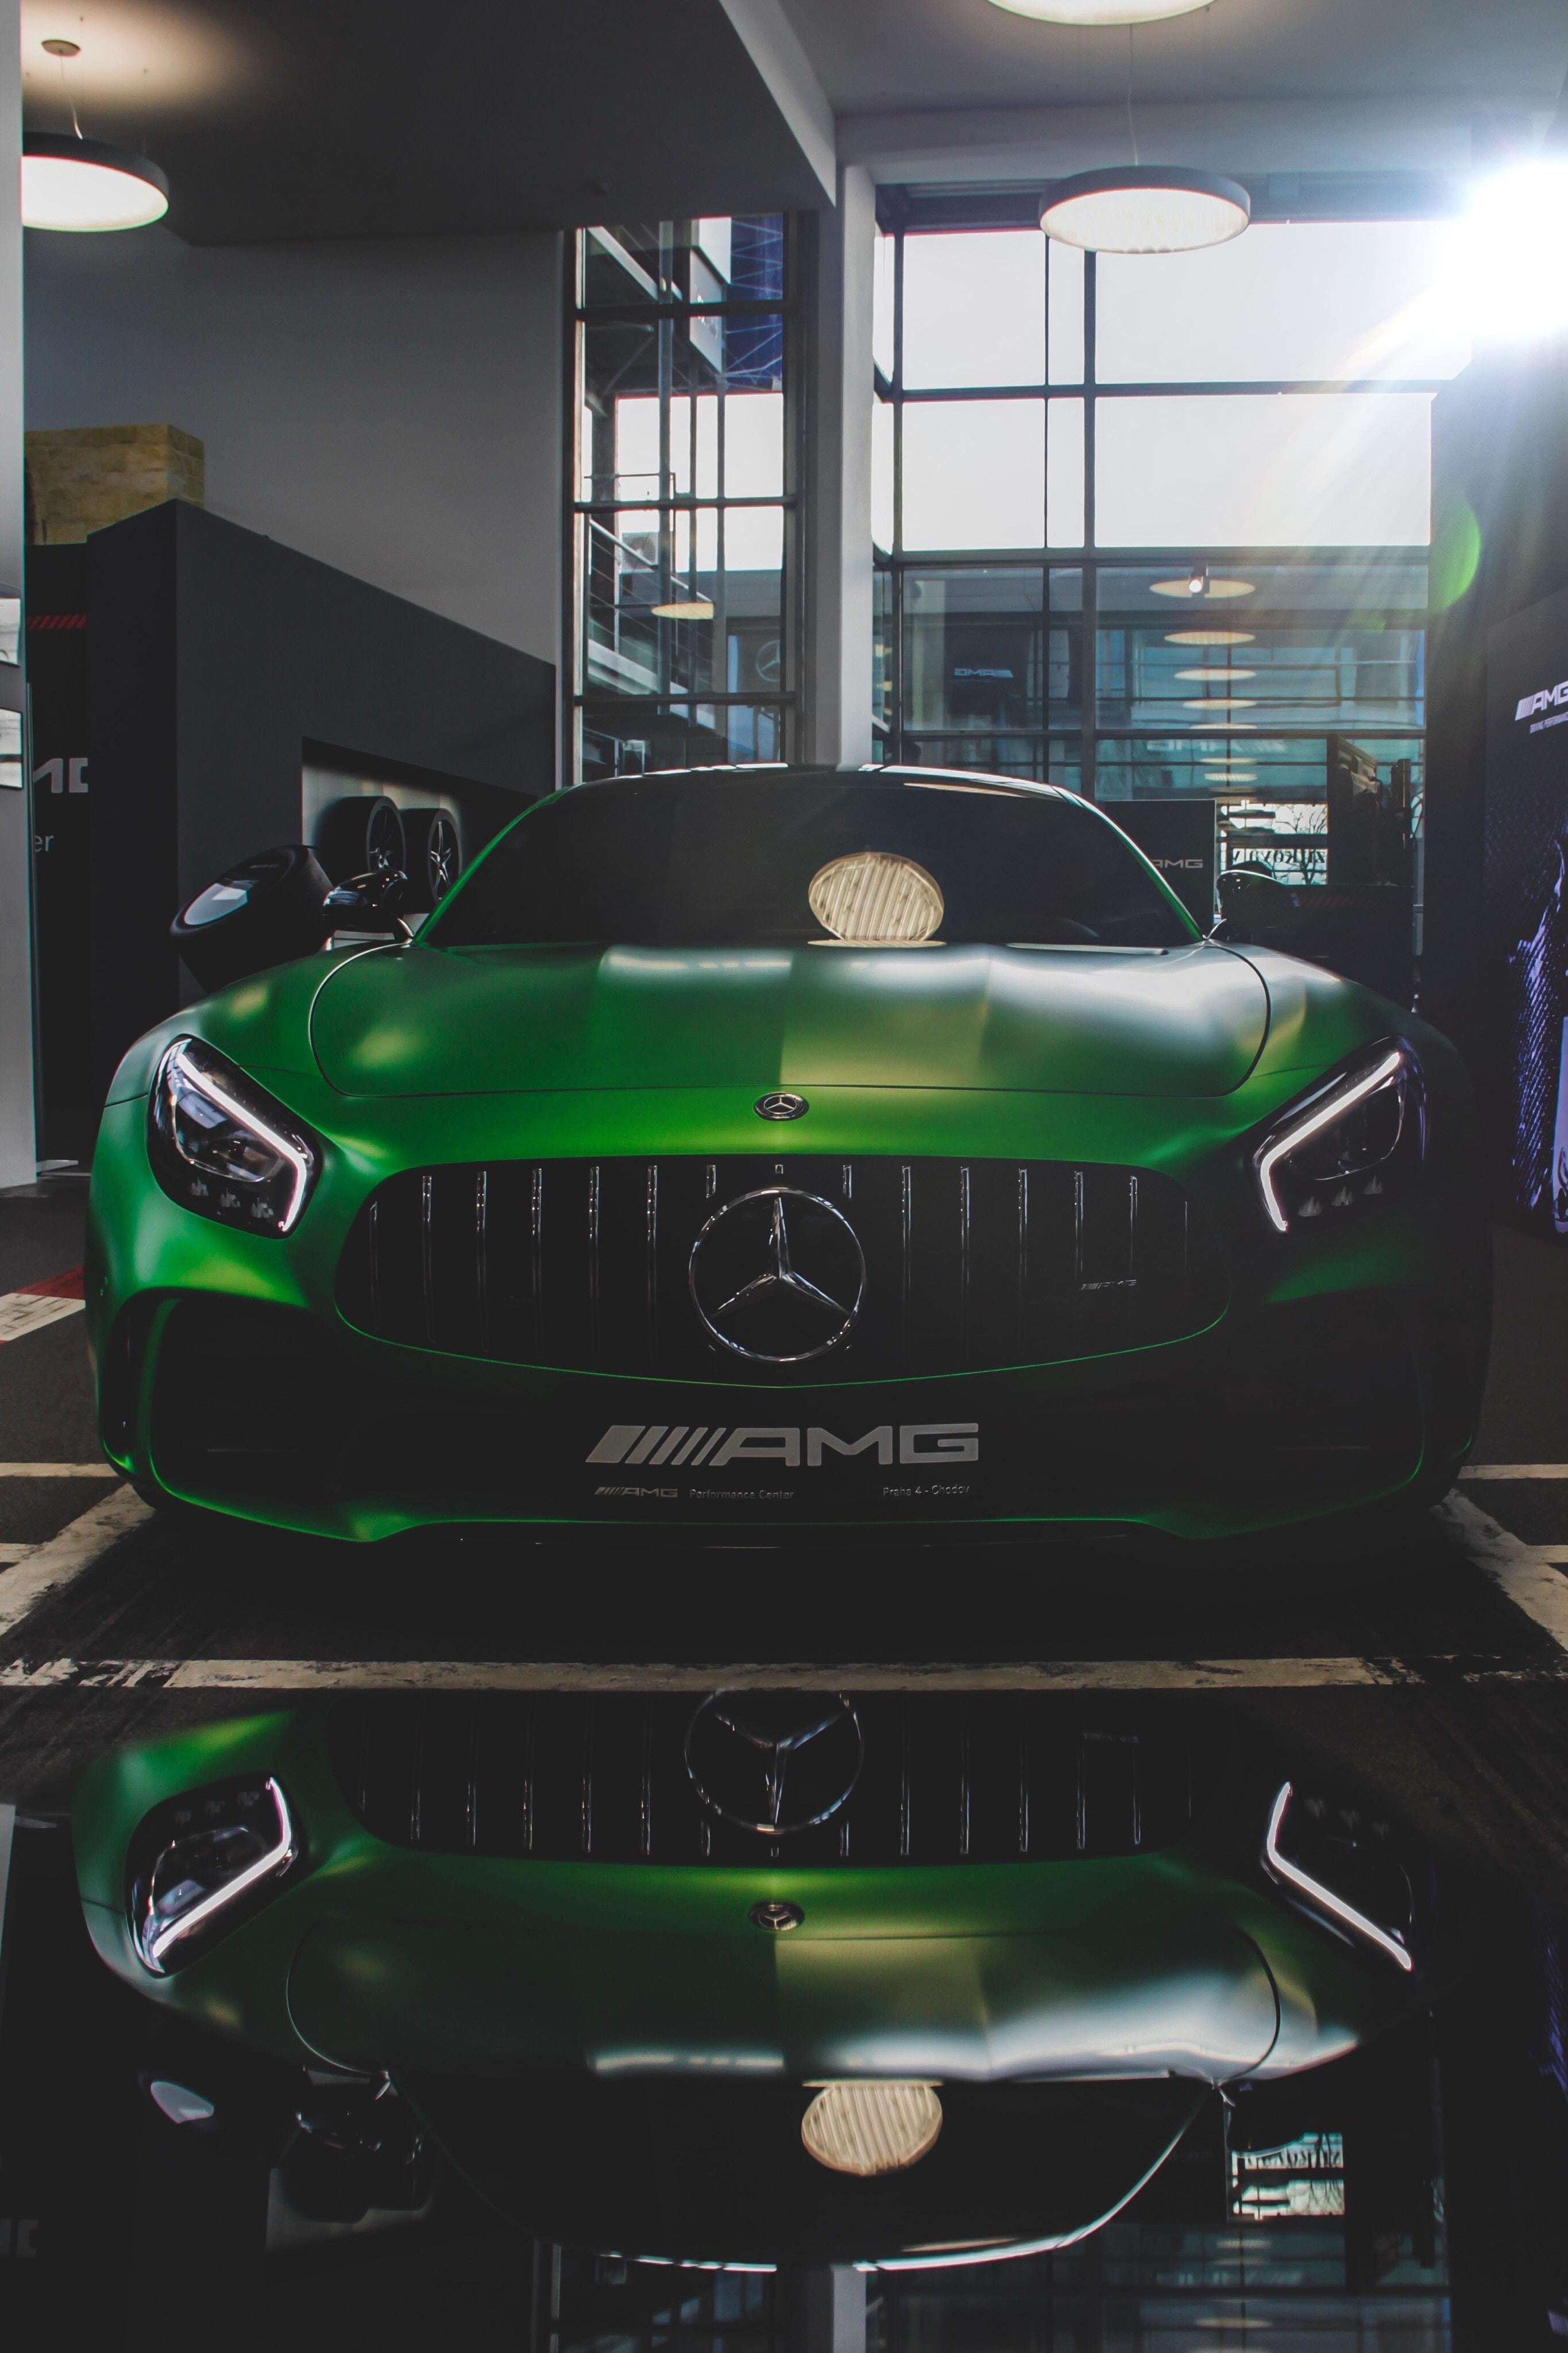 121409 Заставки и Обои Mercedes на телефон. Скачать Mercedes-Amg, Mercedes, Тачки (Cars), Вид Спереди, Зеленый картинки бесплатно